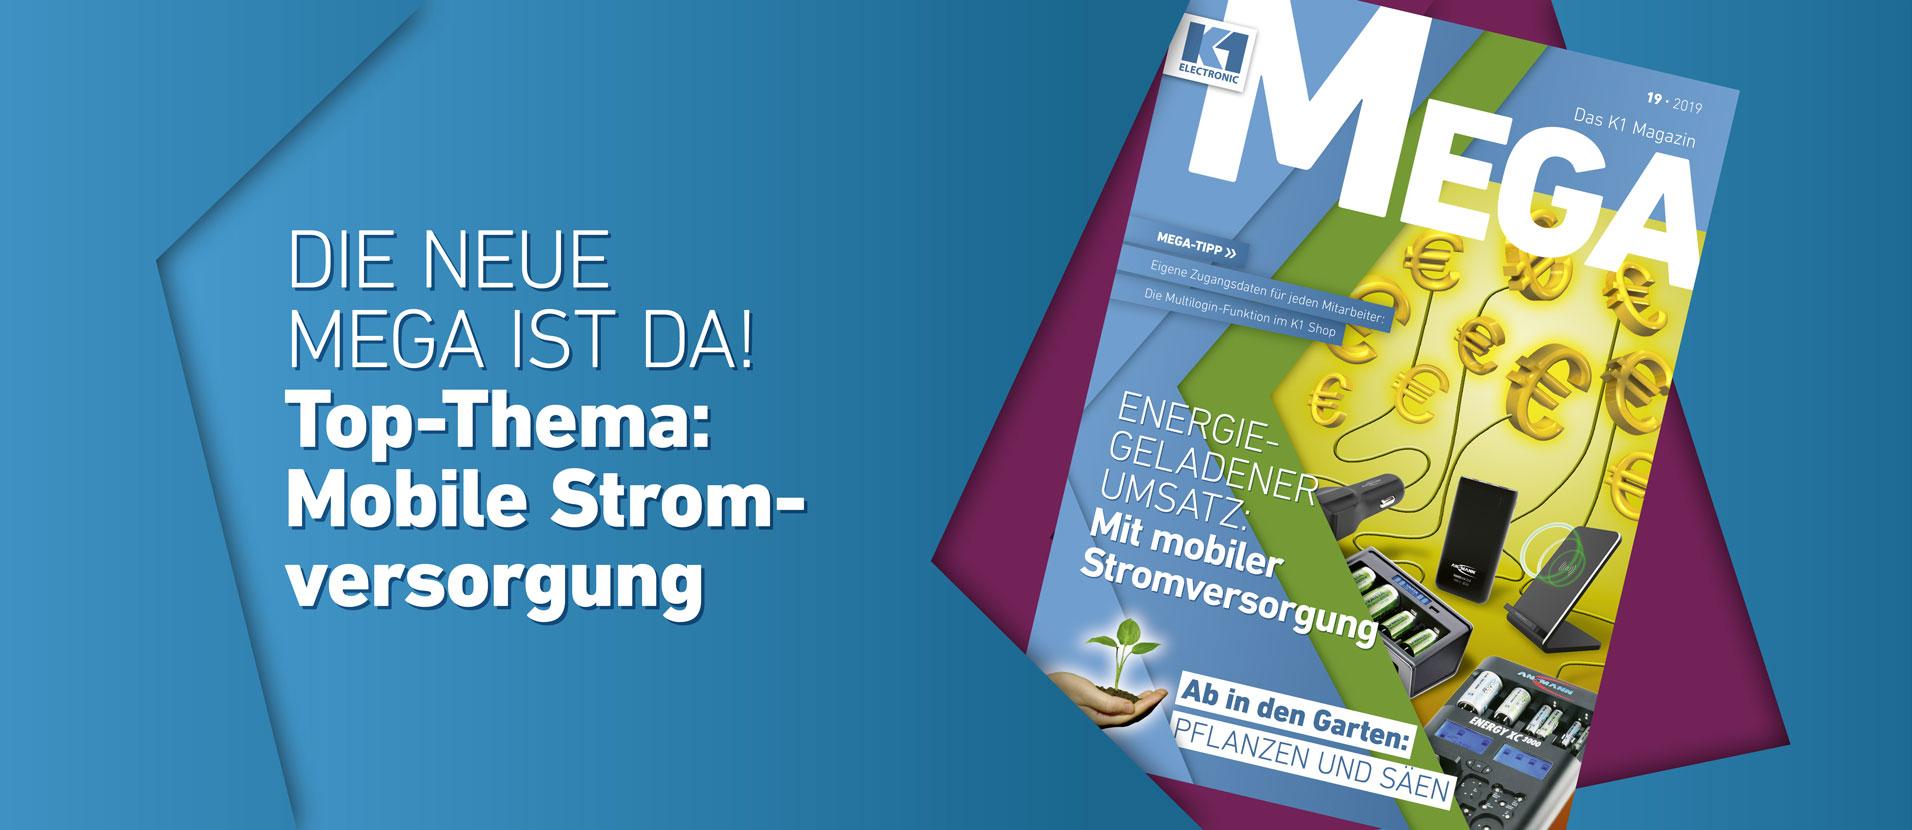 MEGA 19 - Mobile Stromversorgung